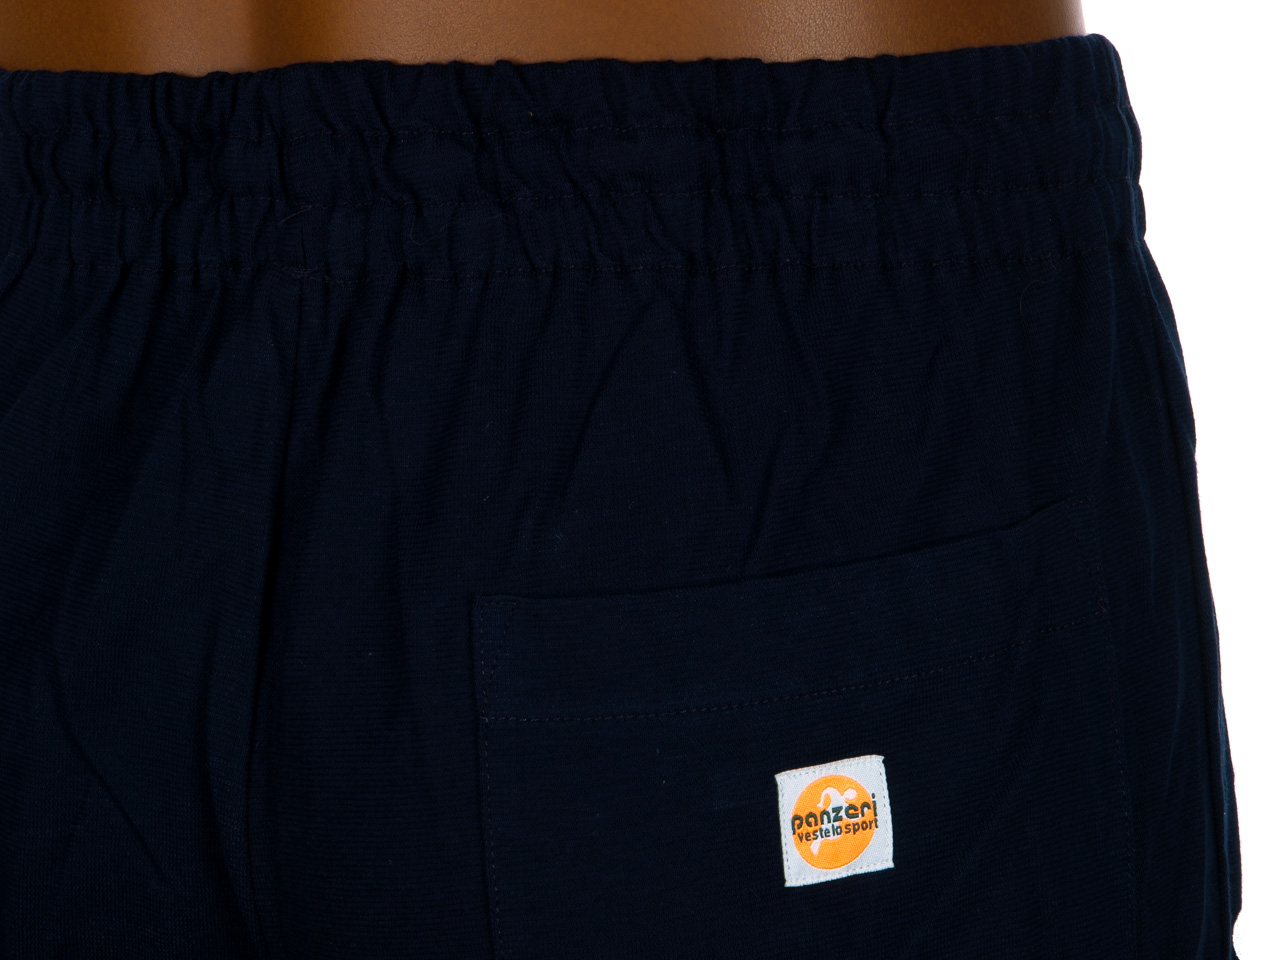 Pantalon de survêtement Panzeri Uni h noir/blc jerseypant Noir 60321 - Neuf